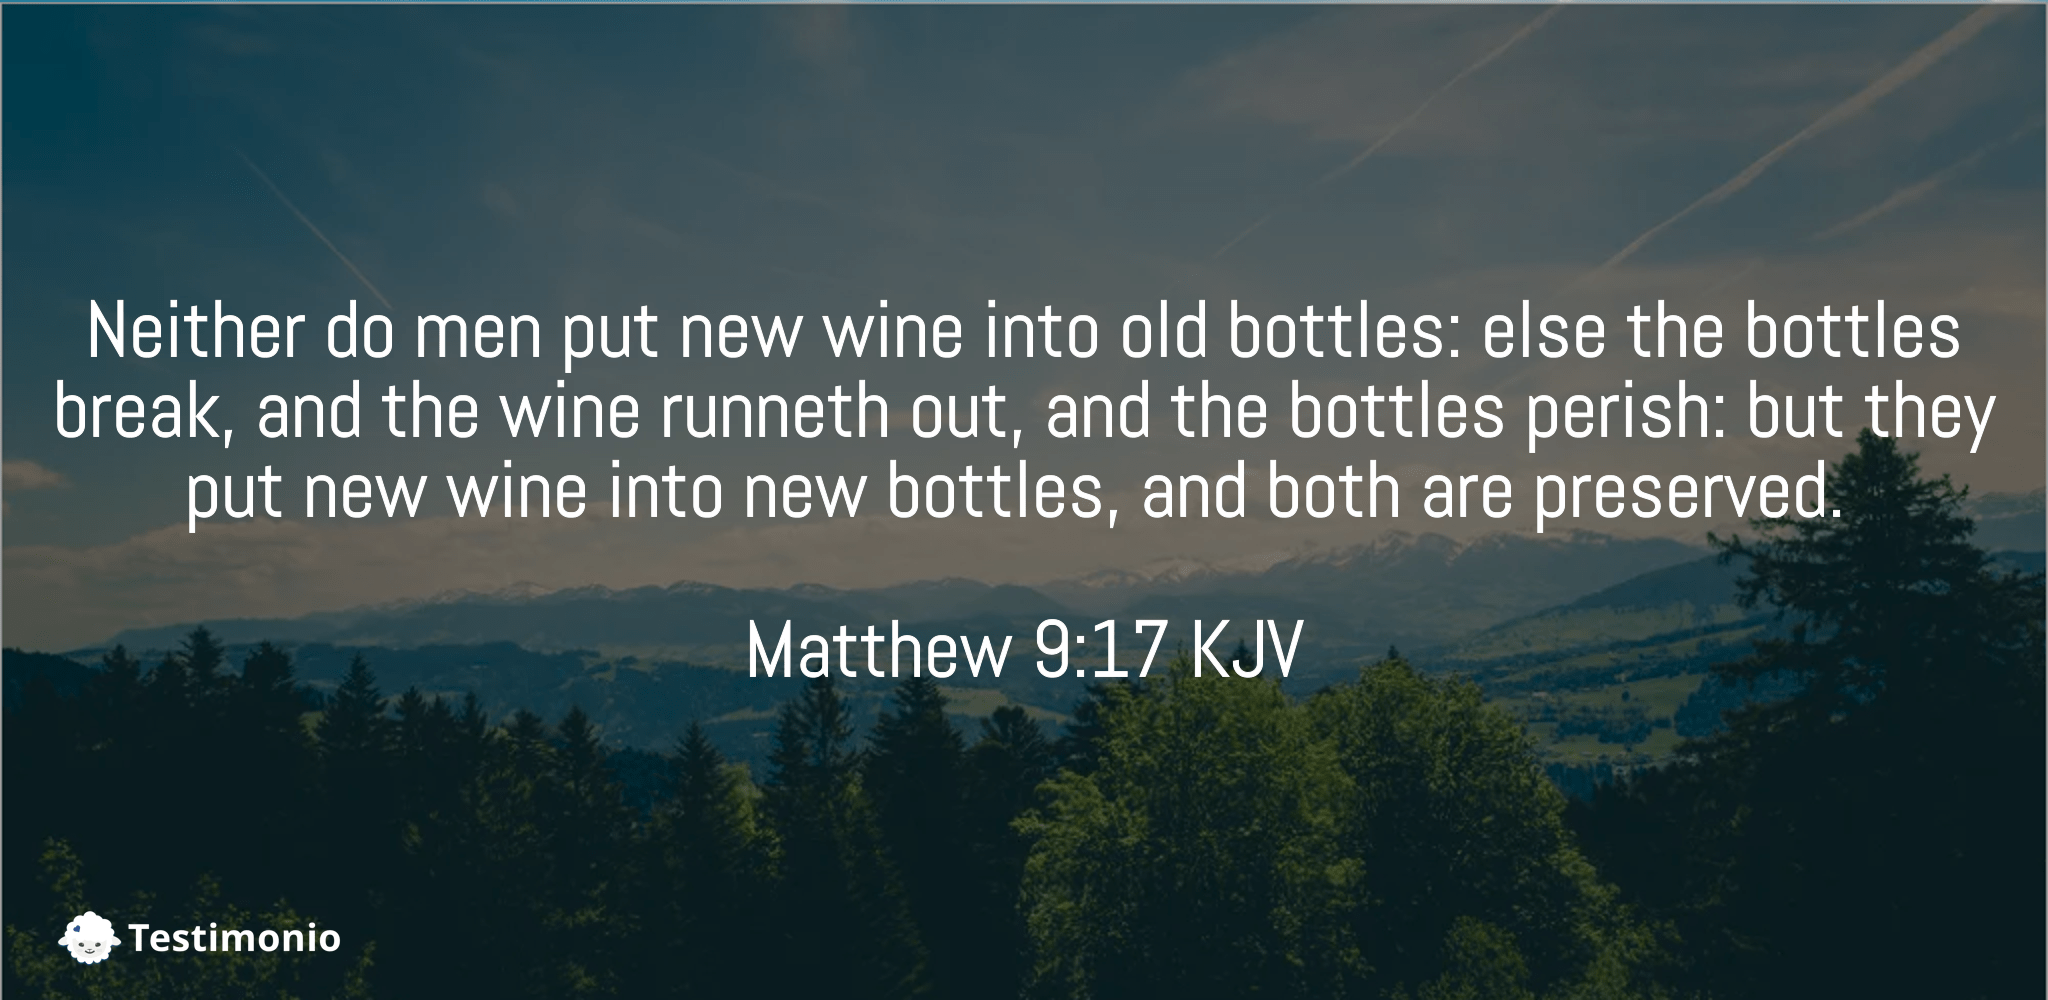 Matthew 9:17